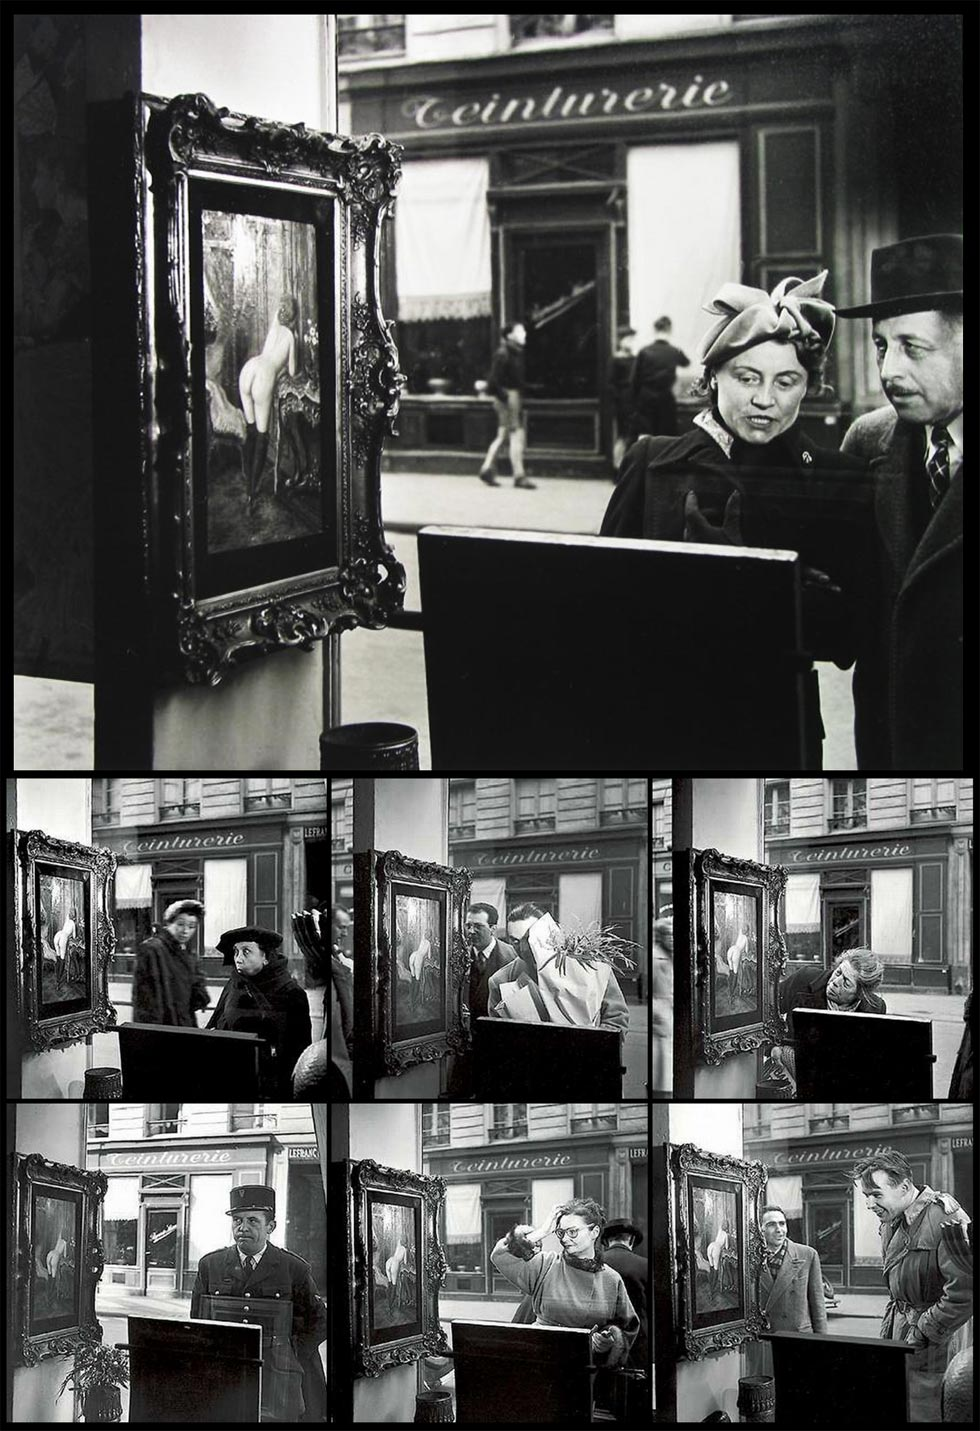 Una mirada oblicua (Robert Doisneau, 1948)